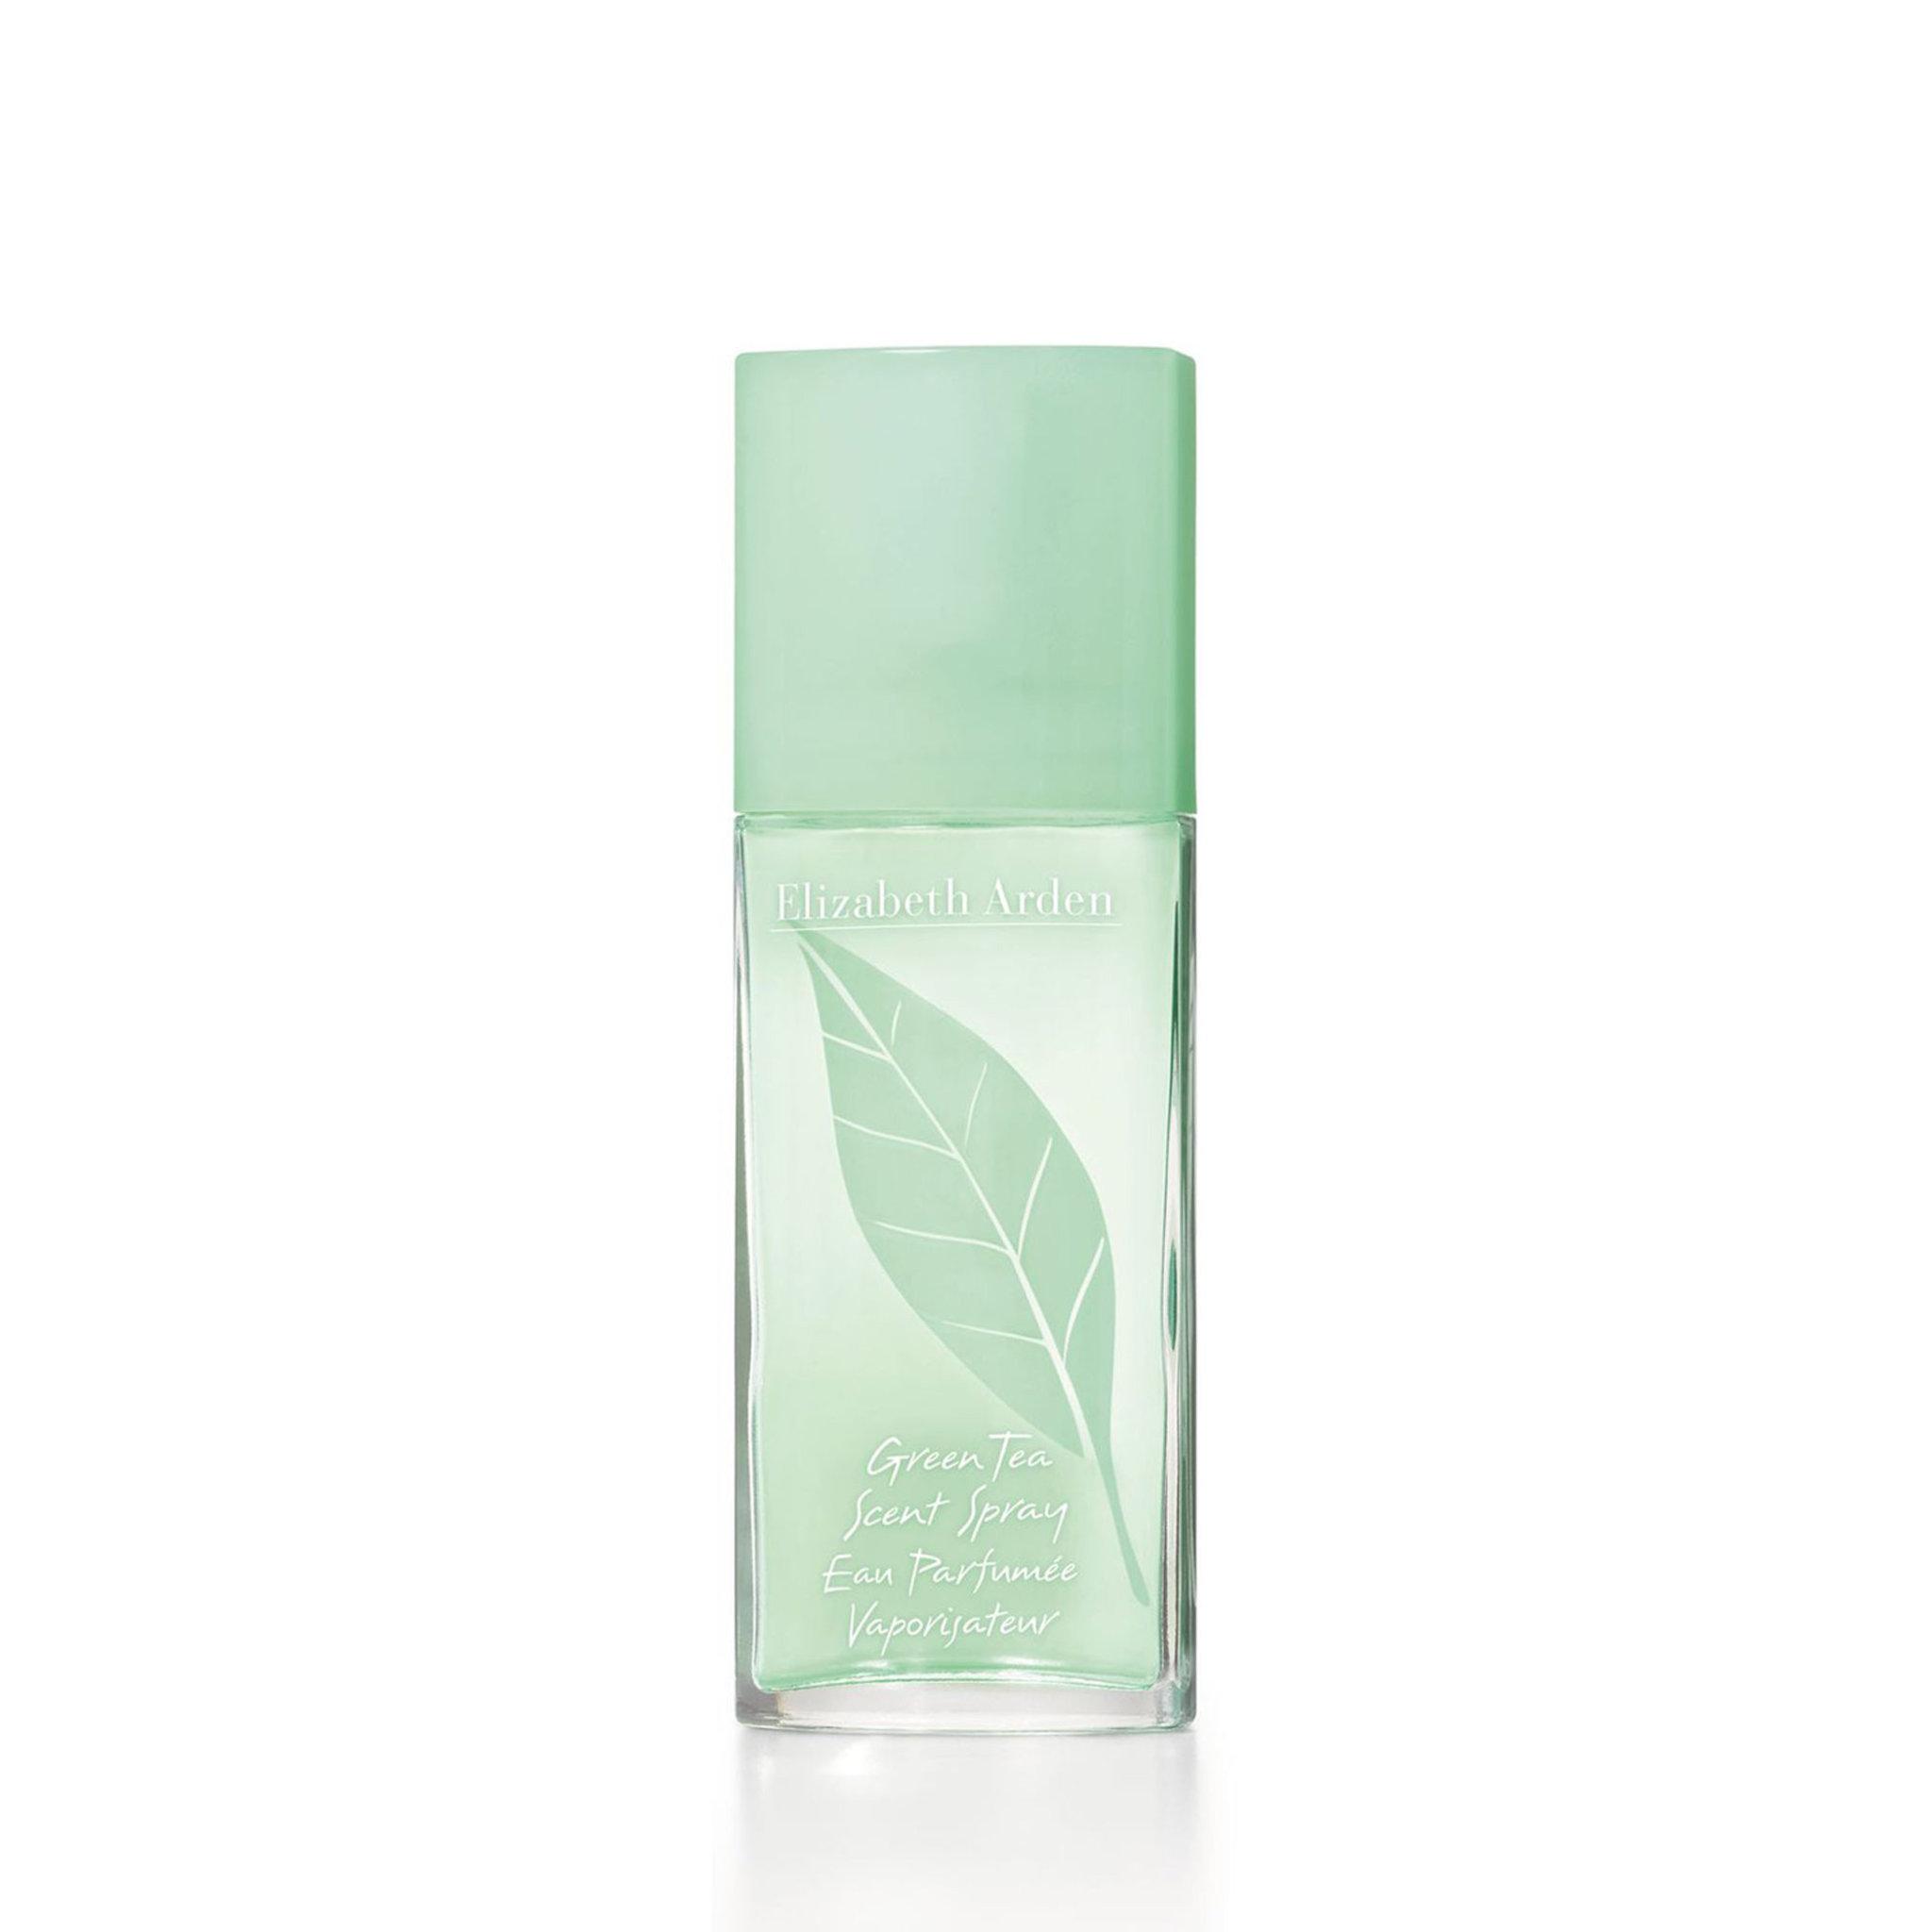 Köp Elizabeth Arden Green Tea Camellia EdT 30ml online